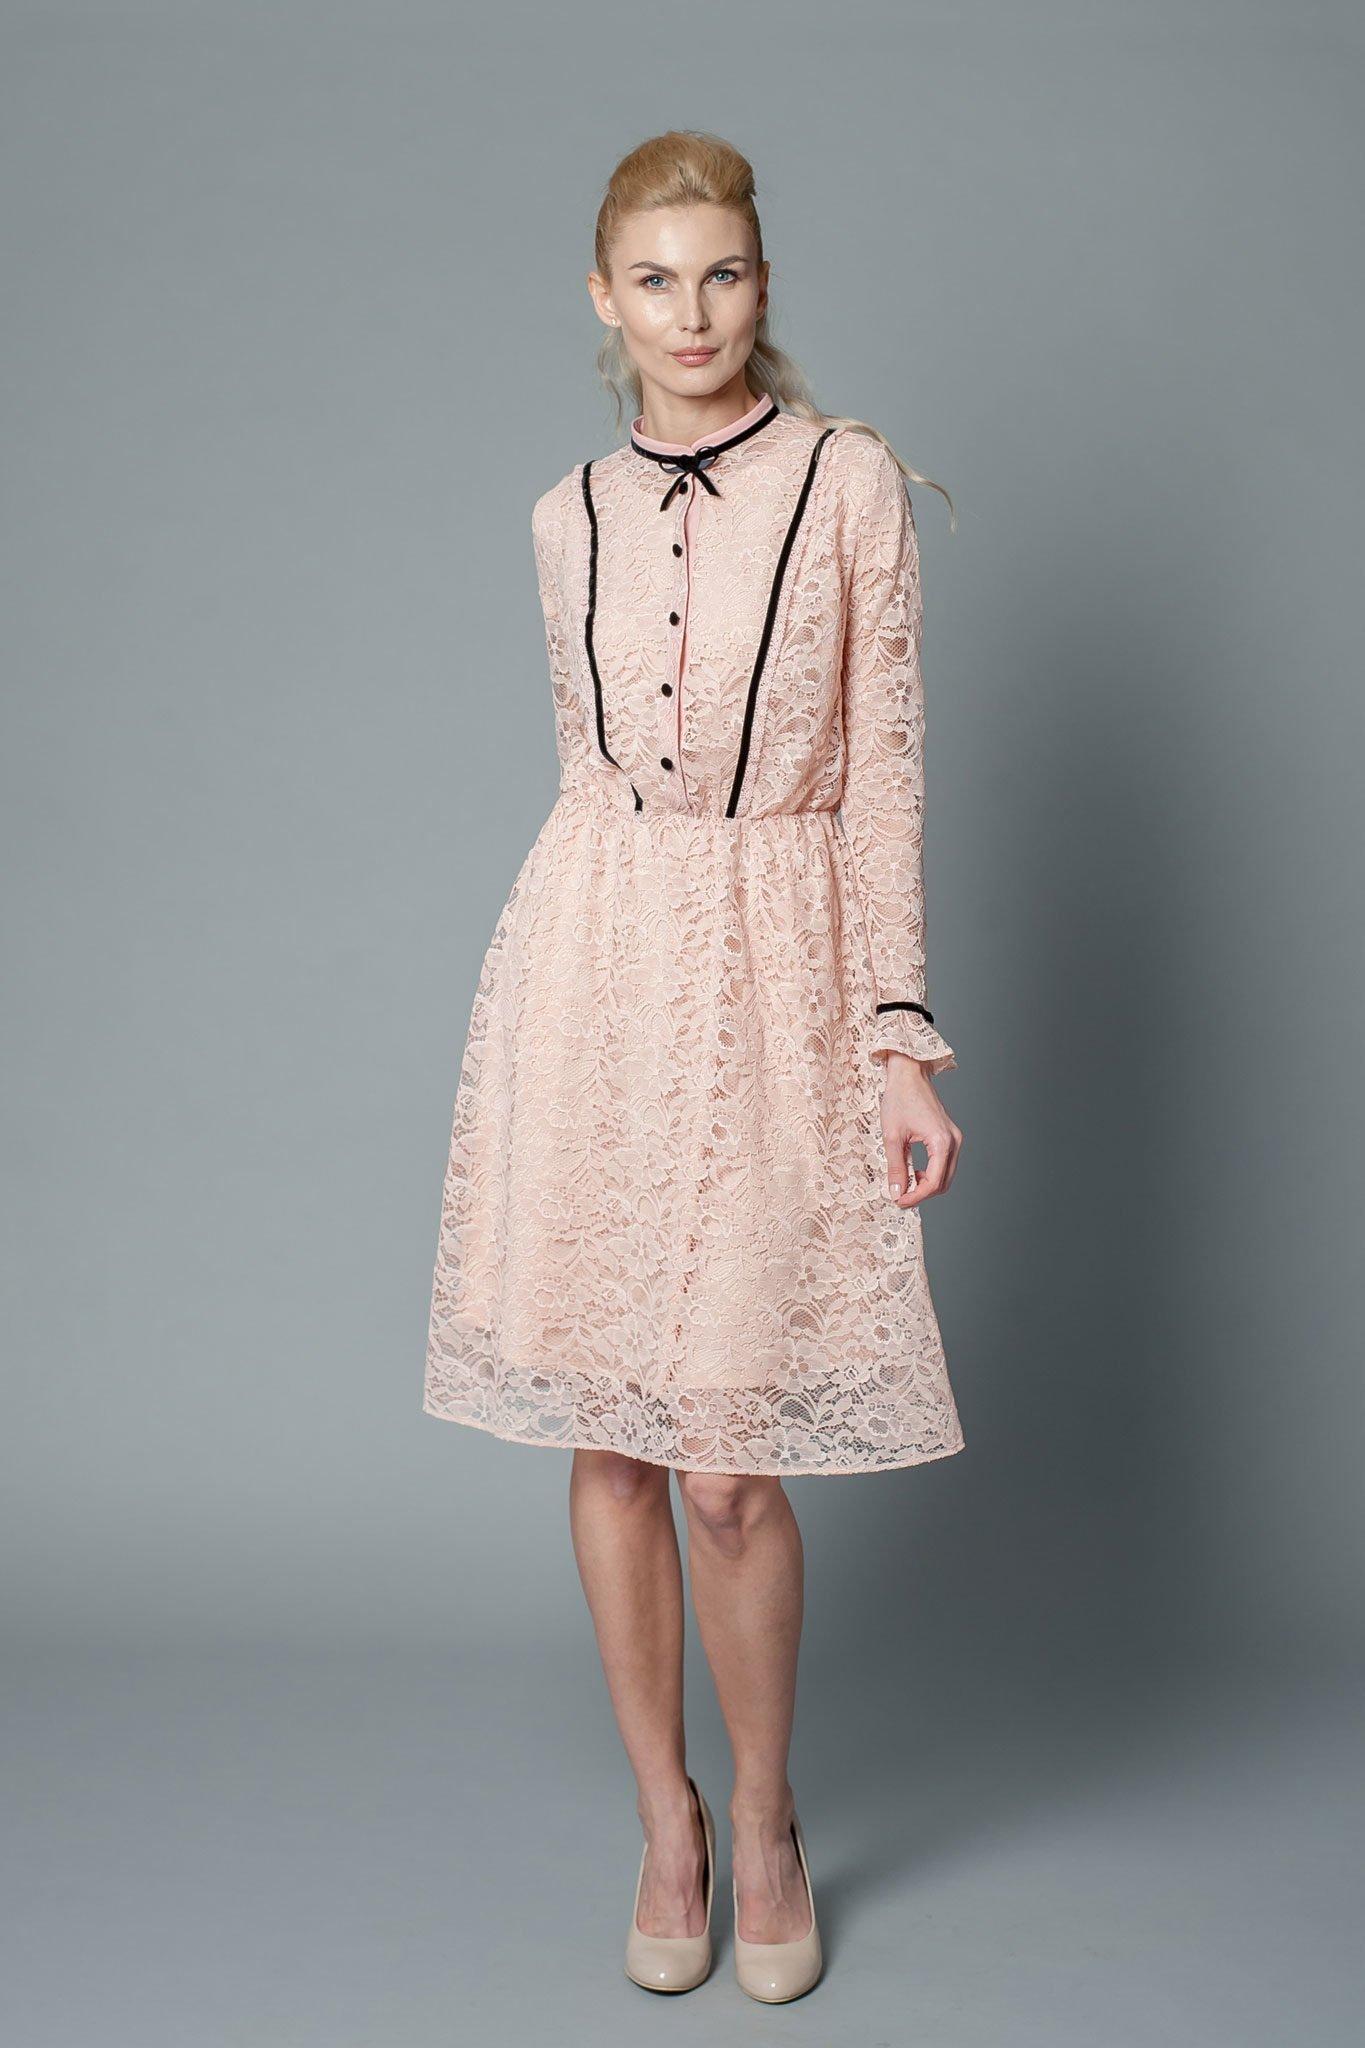 Blush pink knee-length bridesmaid dress with long sleeves